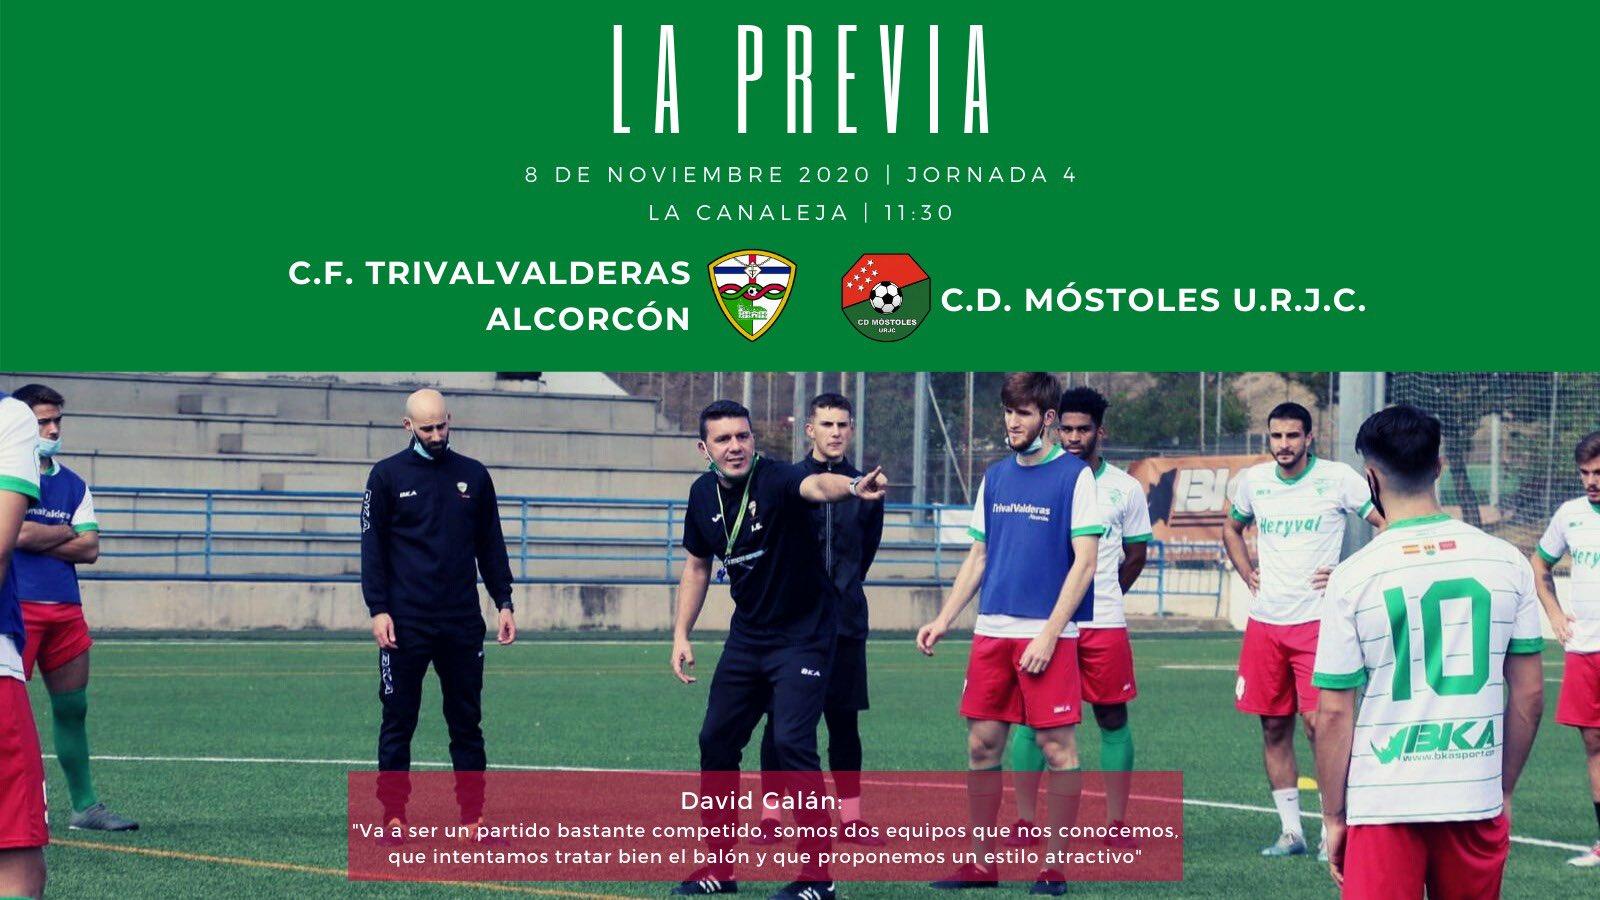 PREVIA J4 |C.F. TrivalValderas Alcorcón - C.D. Móstoles U.R.J.C